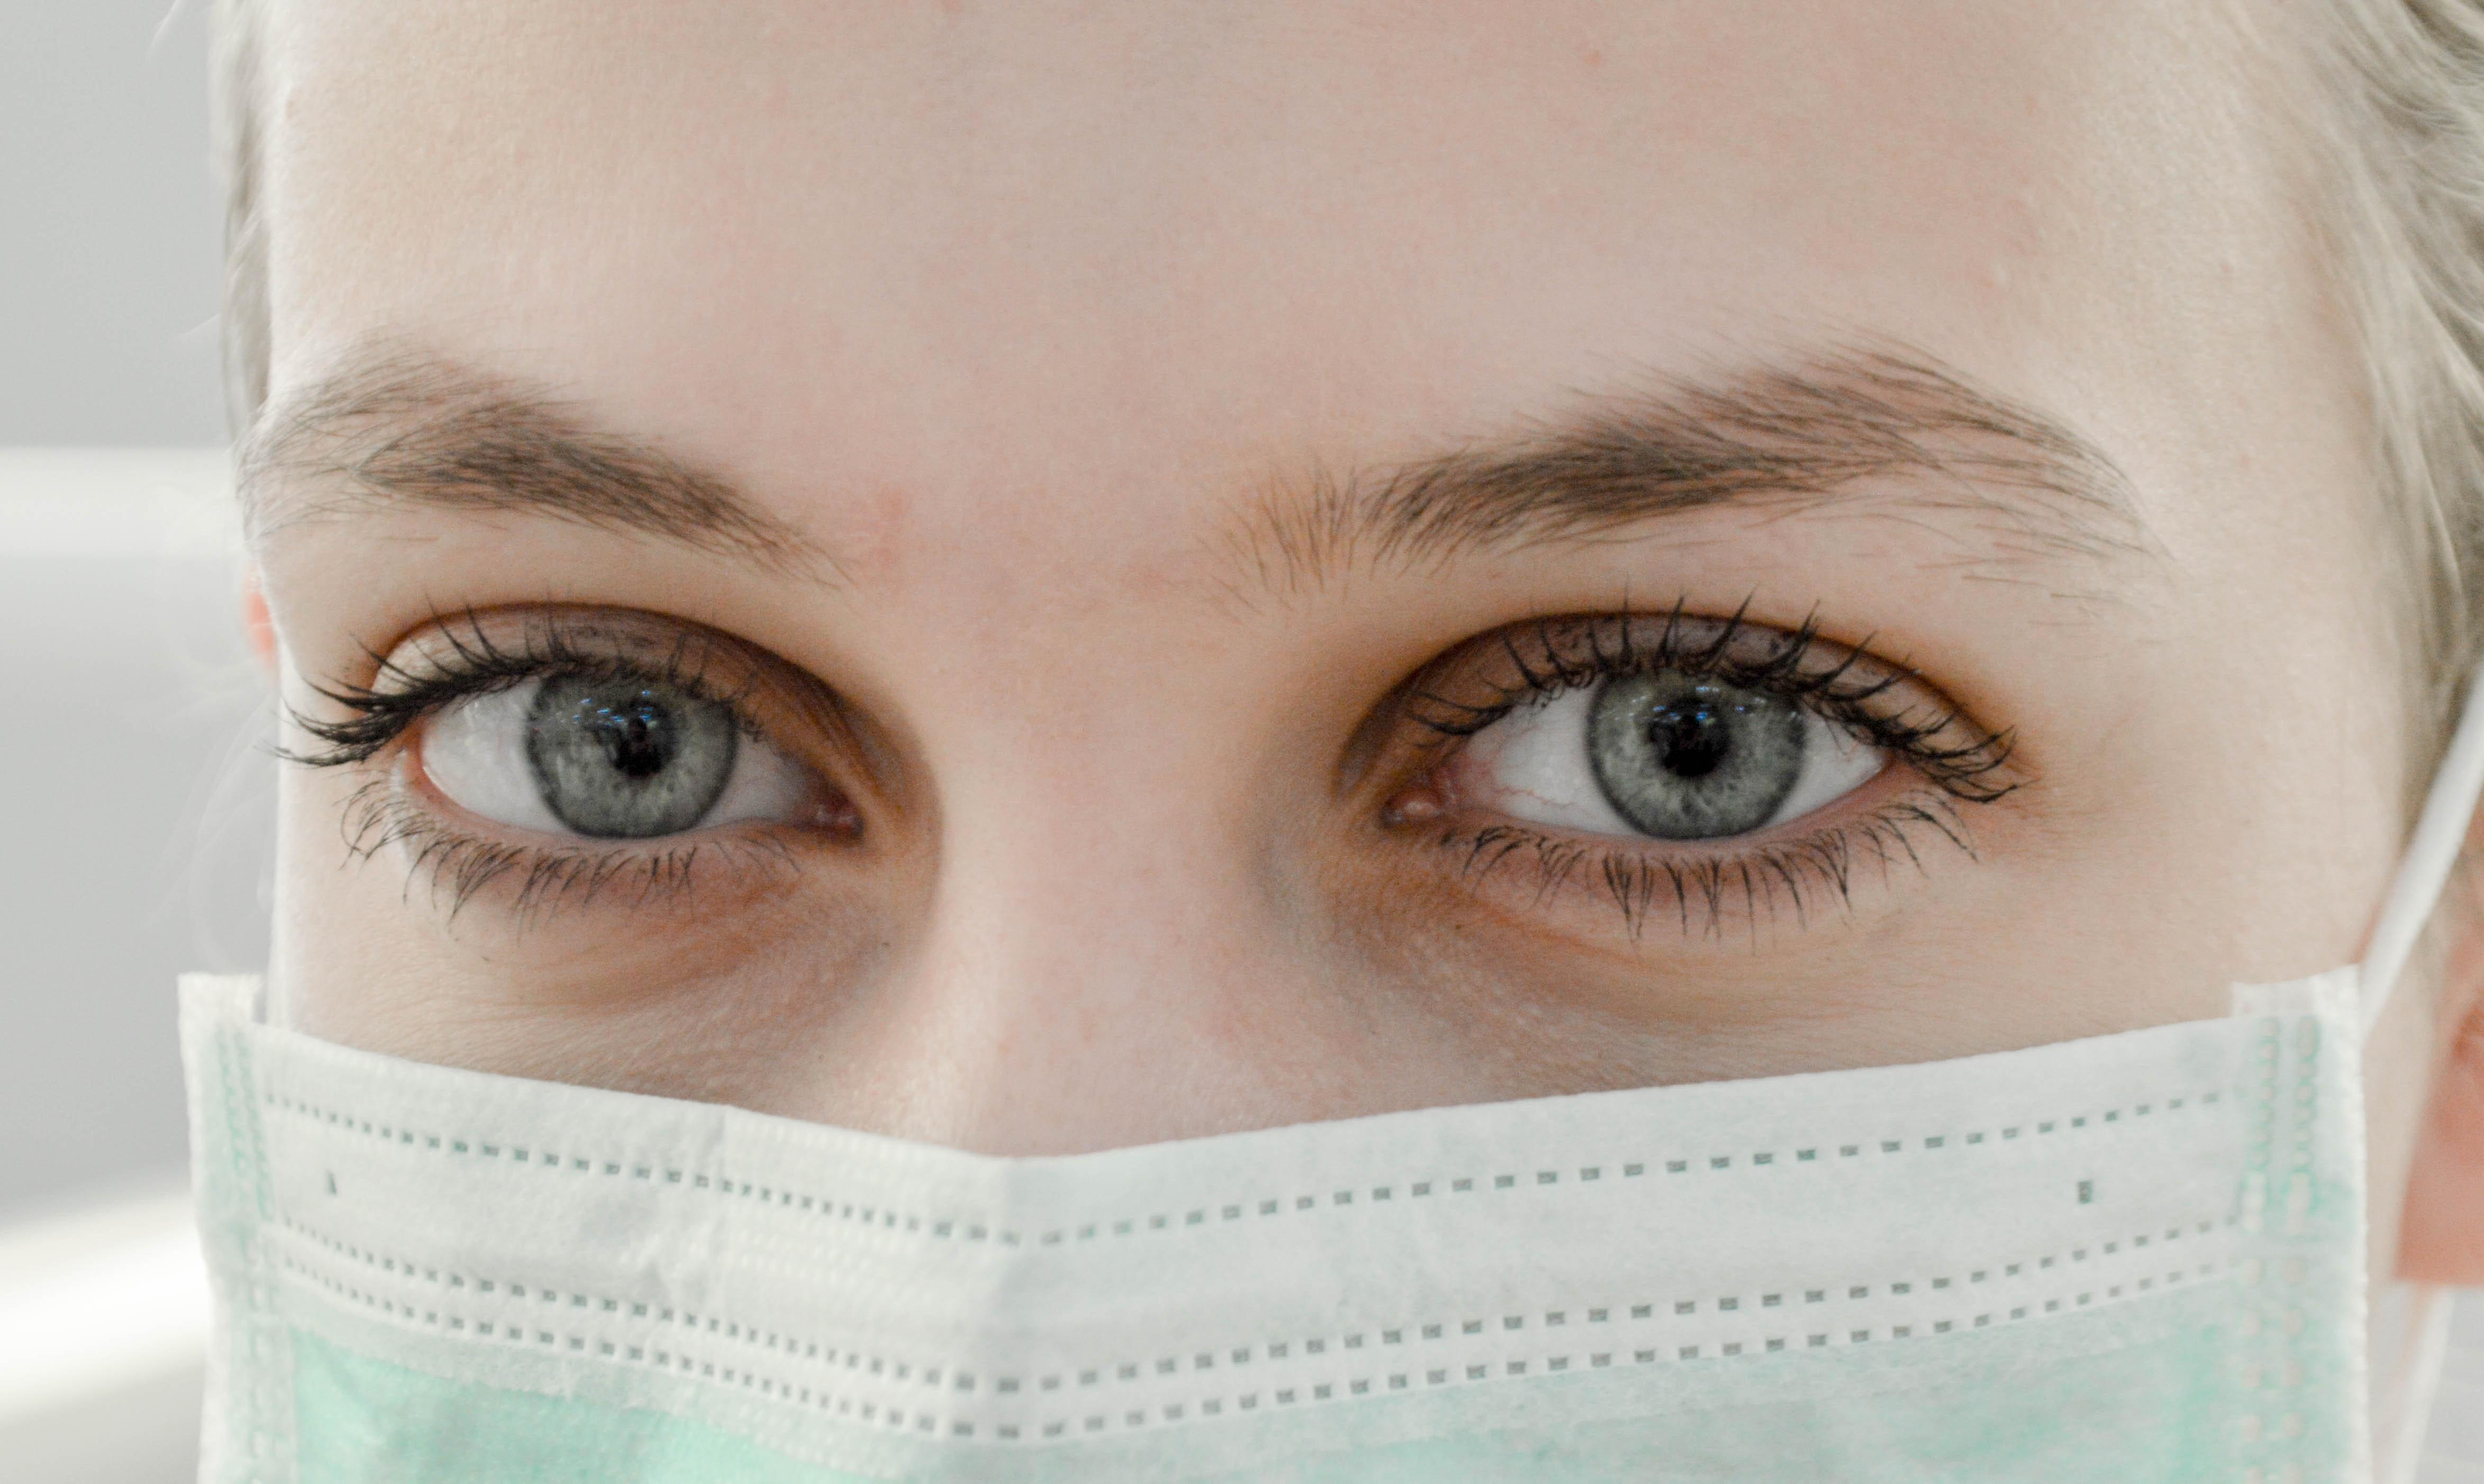 image of nurse wearing mask